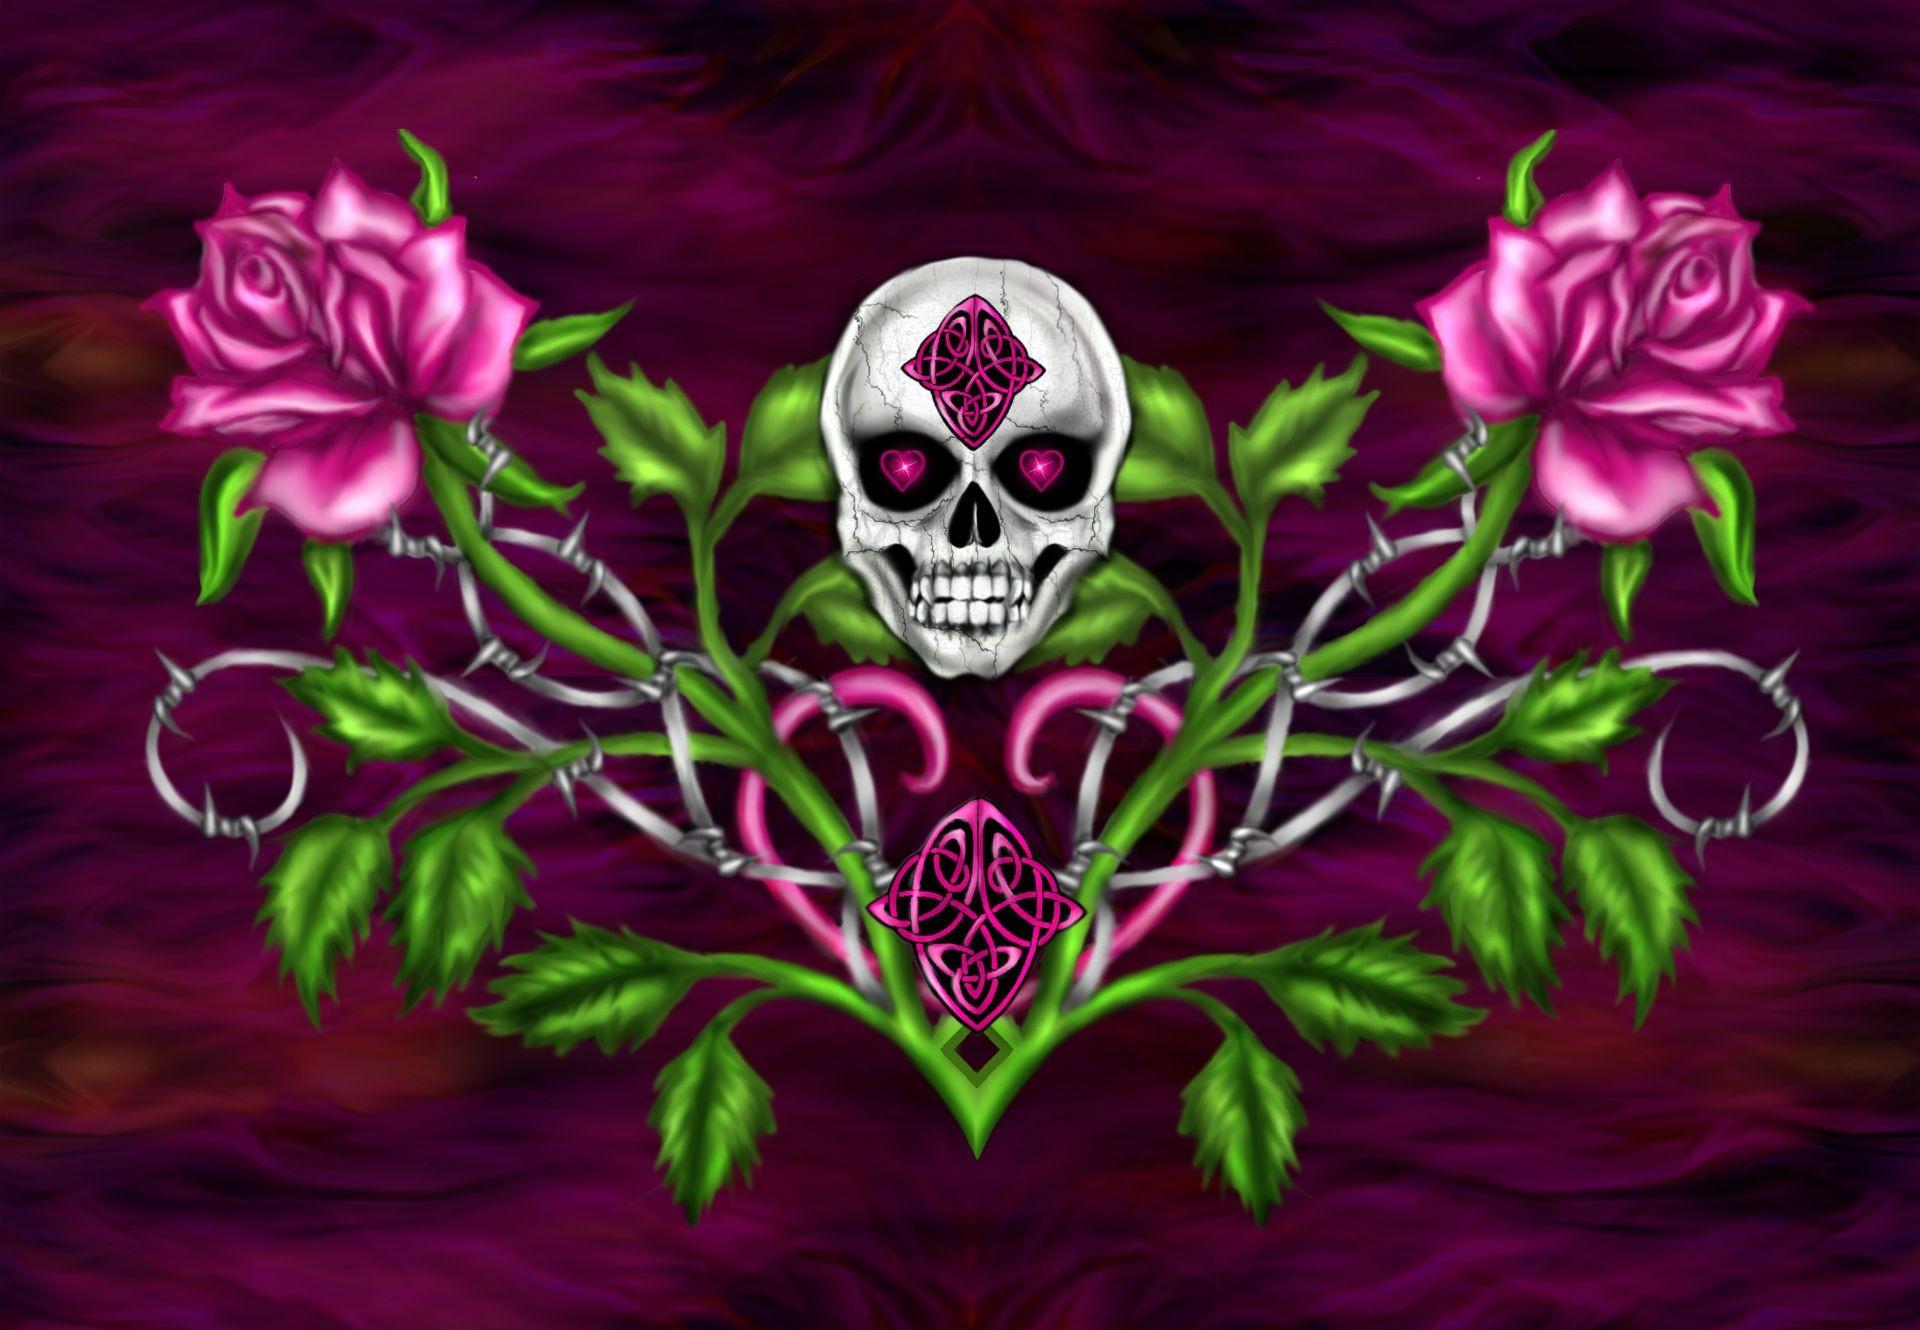 Pastel Goth Girl Wallpaper Cool Skulls Wallpapers 53 Images